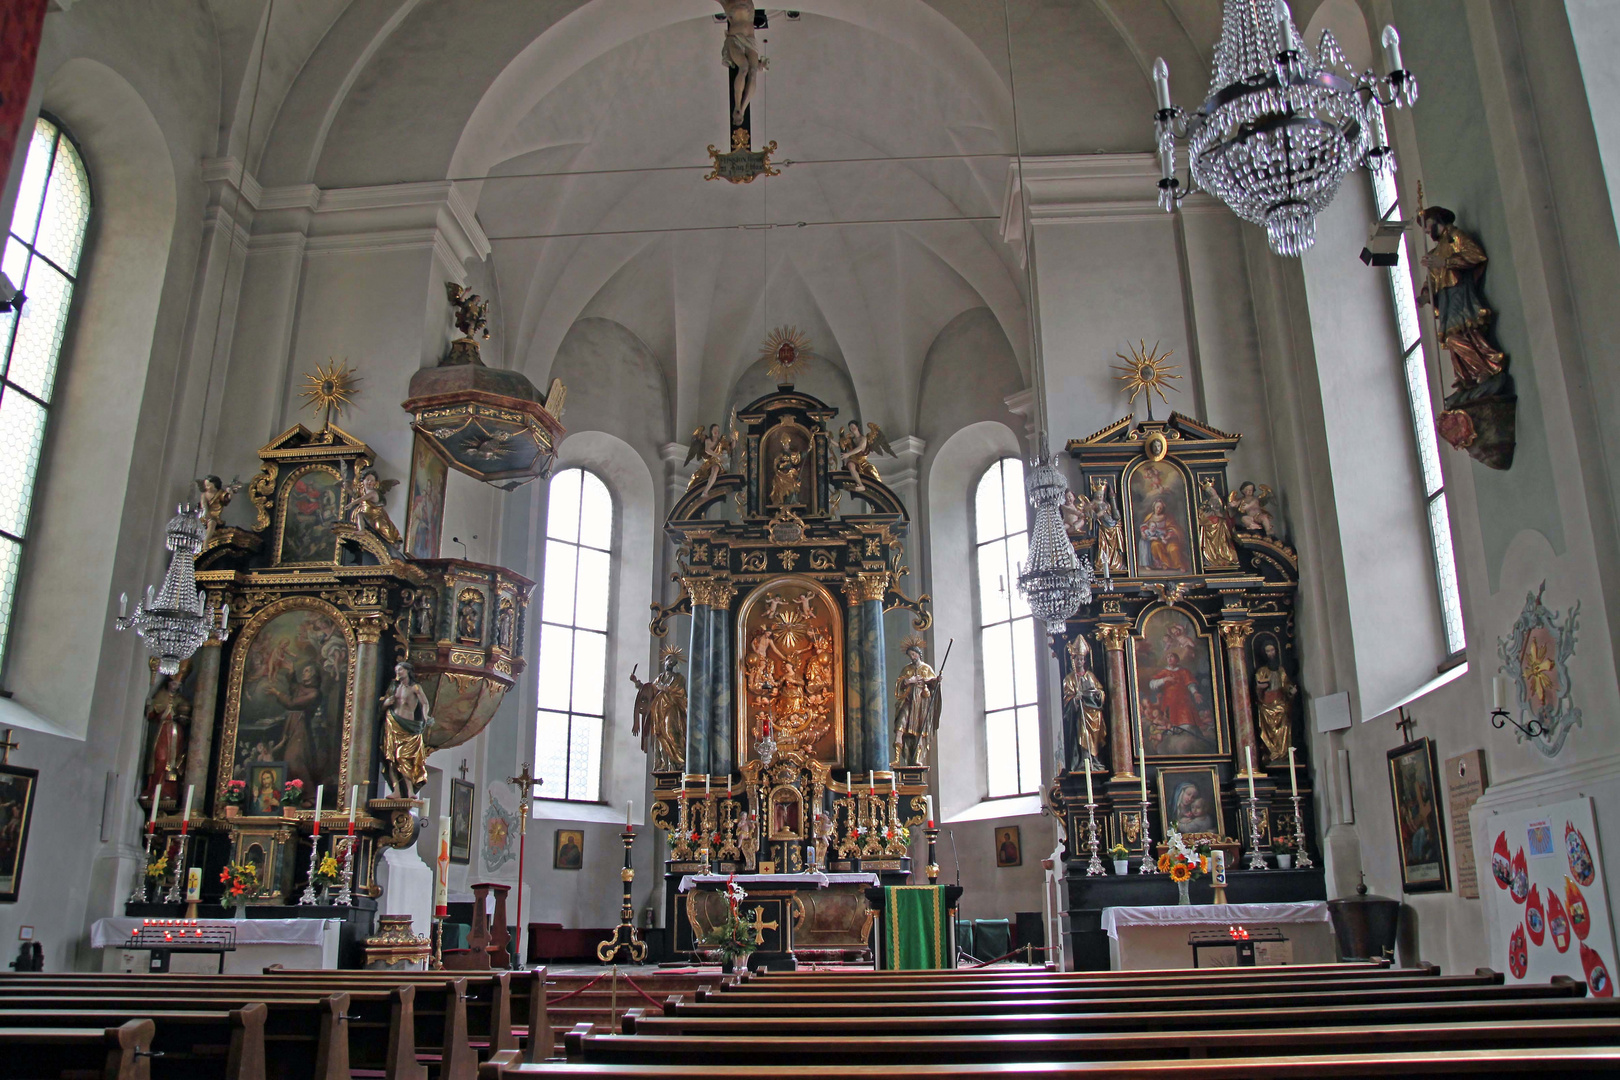 Kath. Pfarrkirche, Saalbach-Hinterglemm